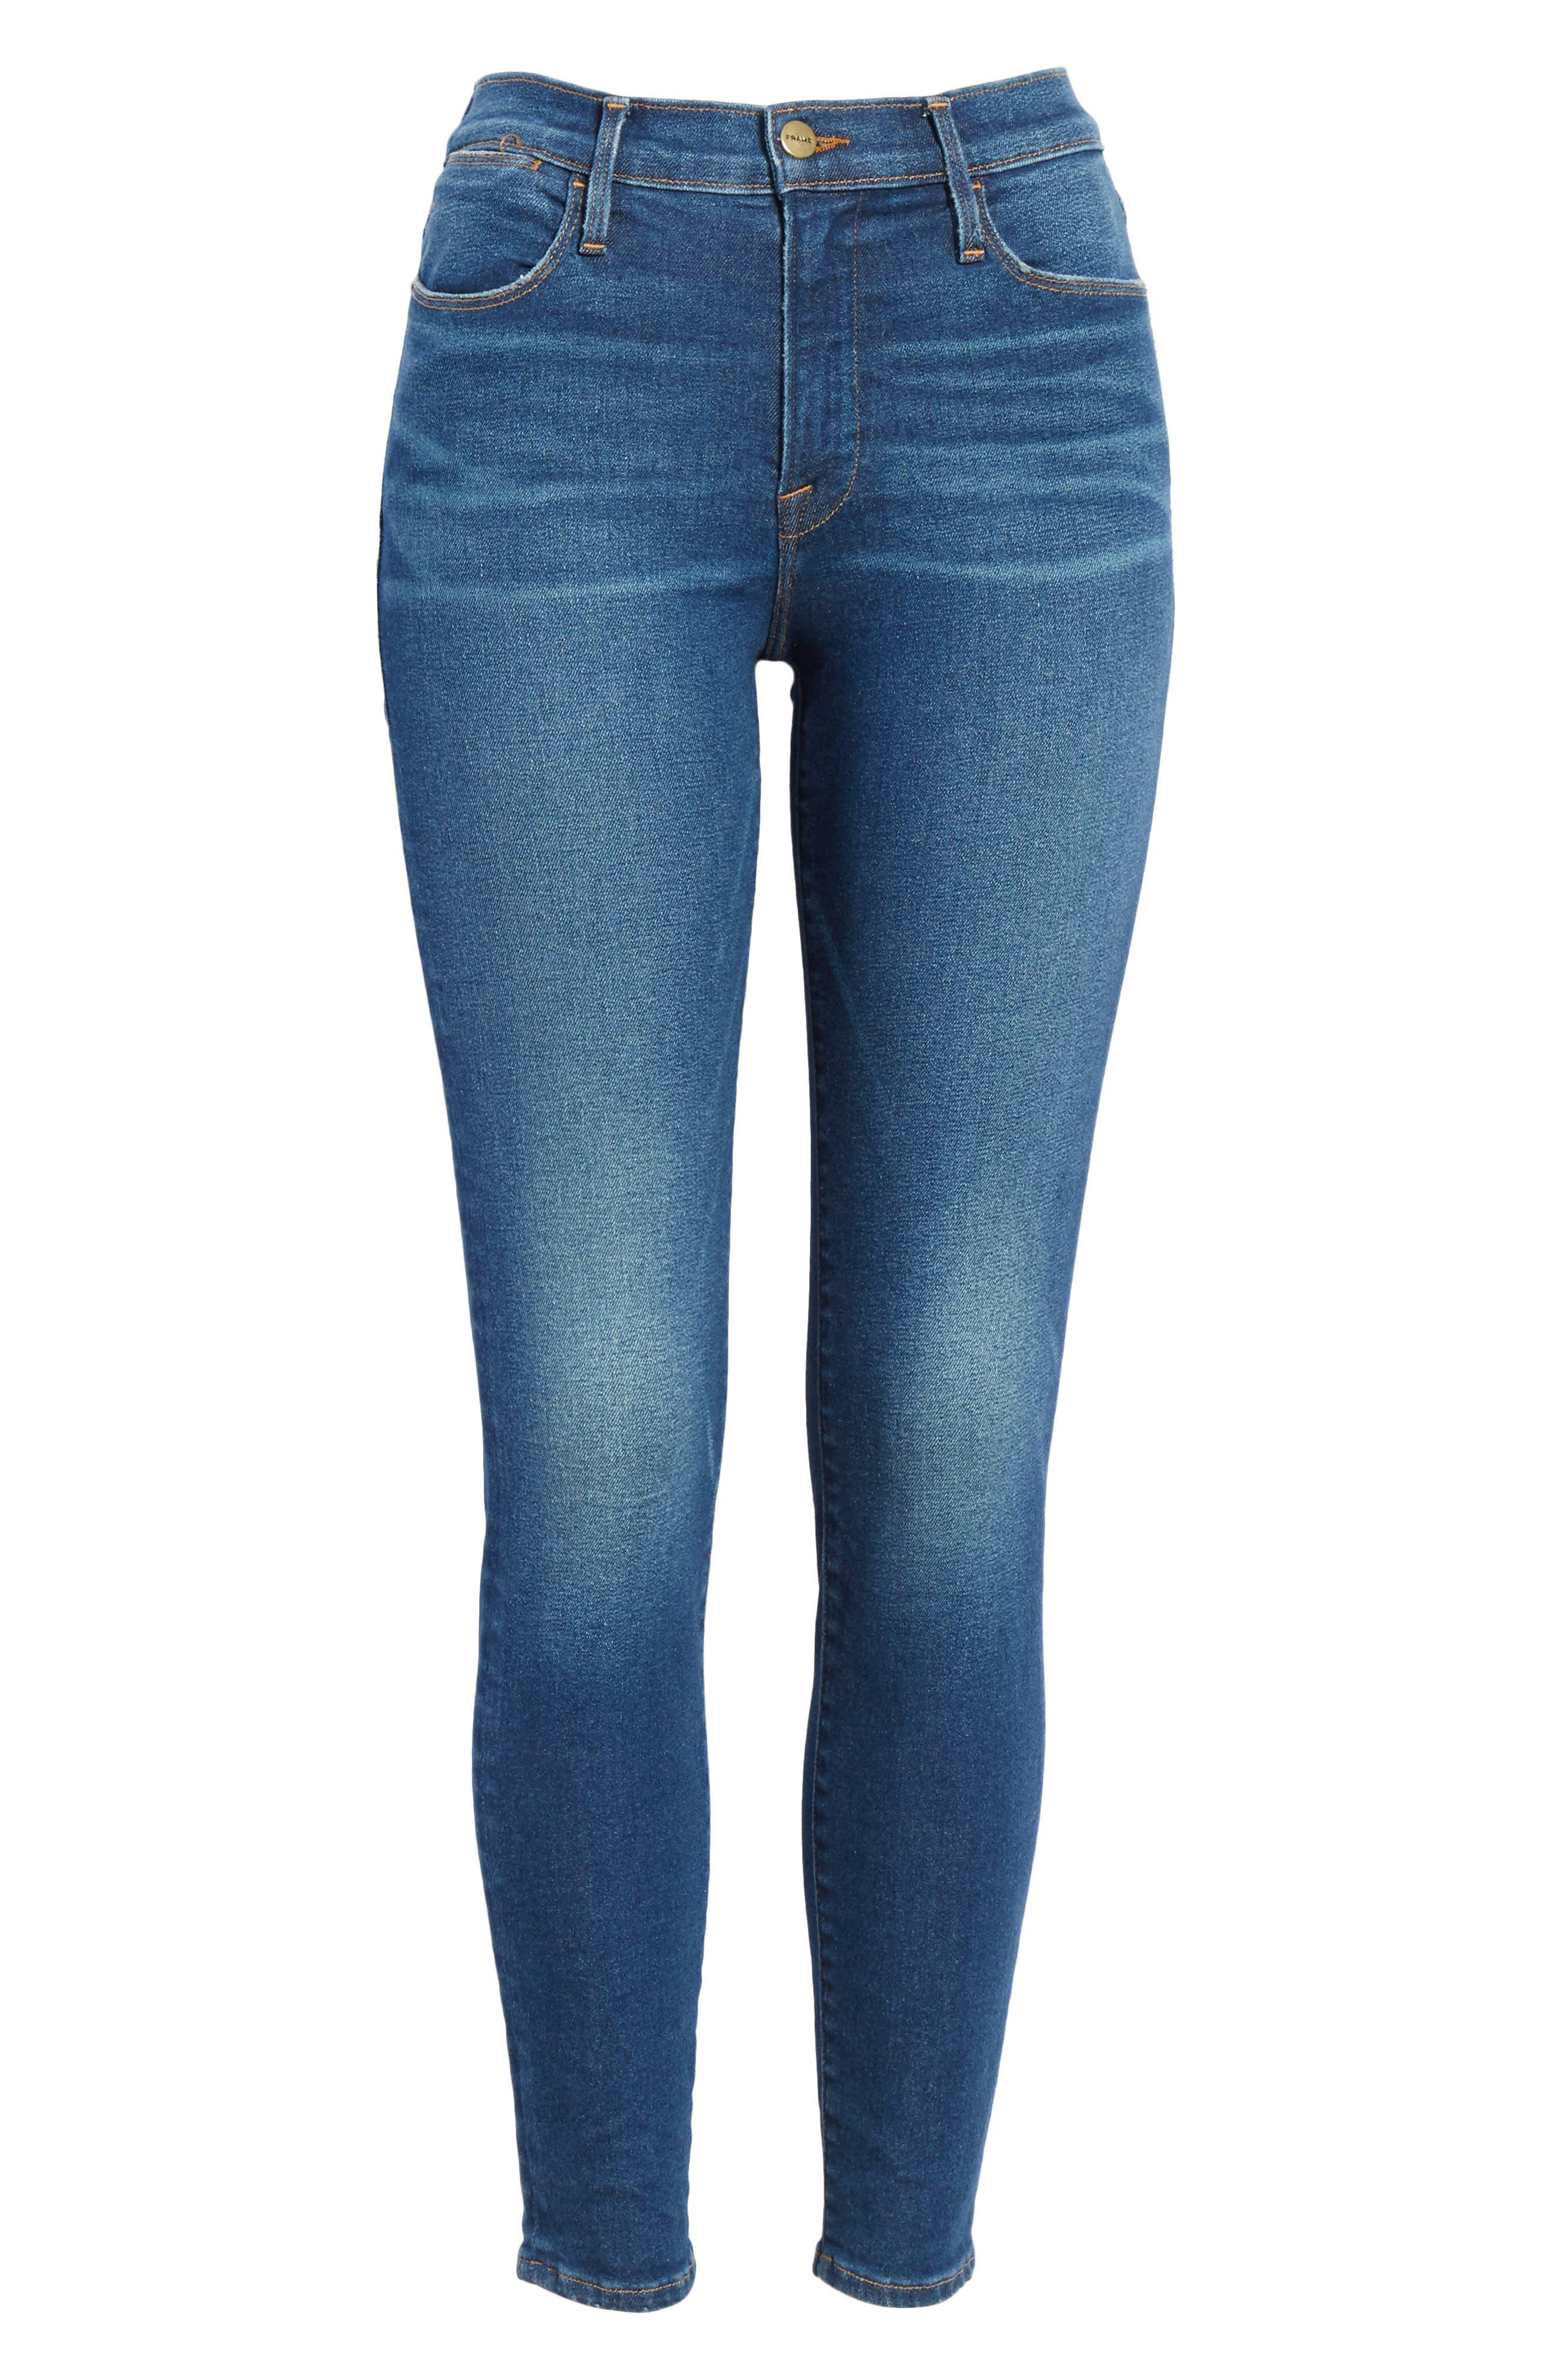 Le High Skinny Jeans,                             Alternate thumbnail 7, color,                             401